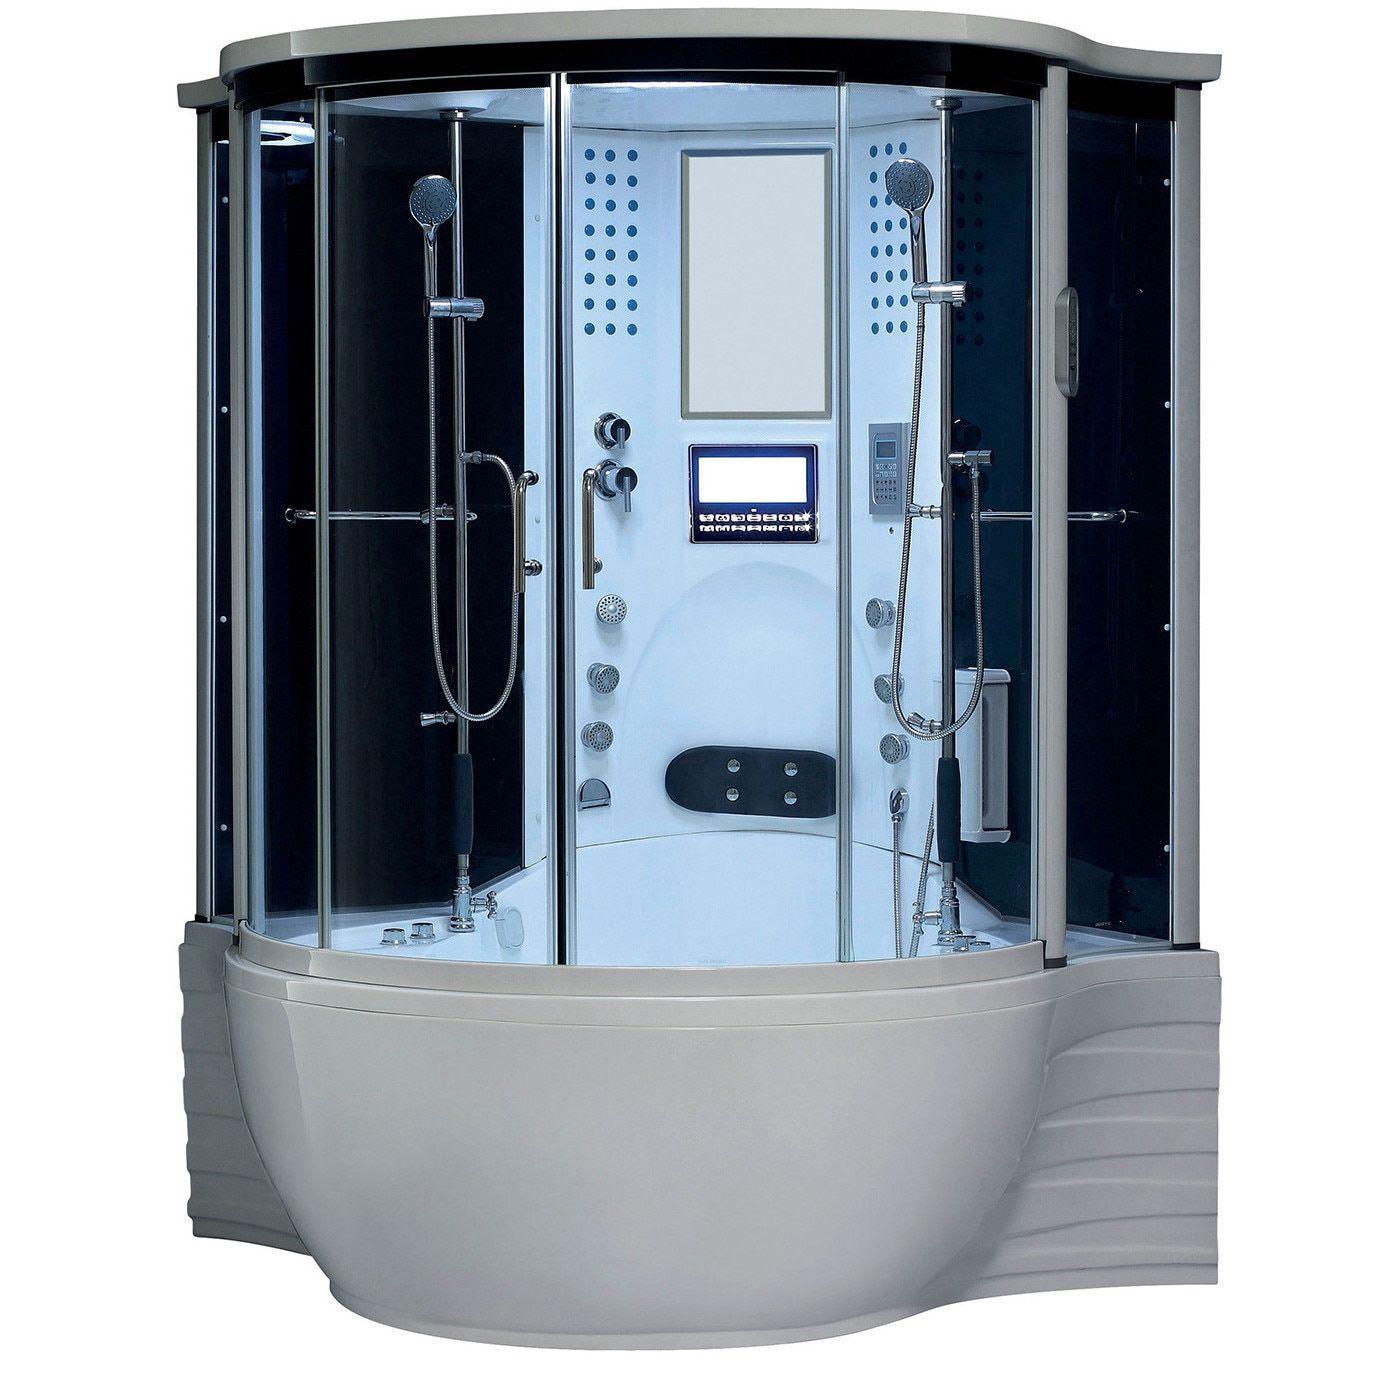 Maya Bath Florence Acrylic/Glass/Stainless Steel Steam Shower Sauna With  Whirlpool Massage Bathtub